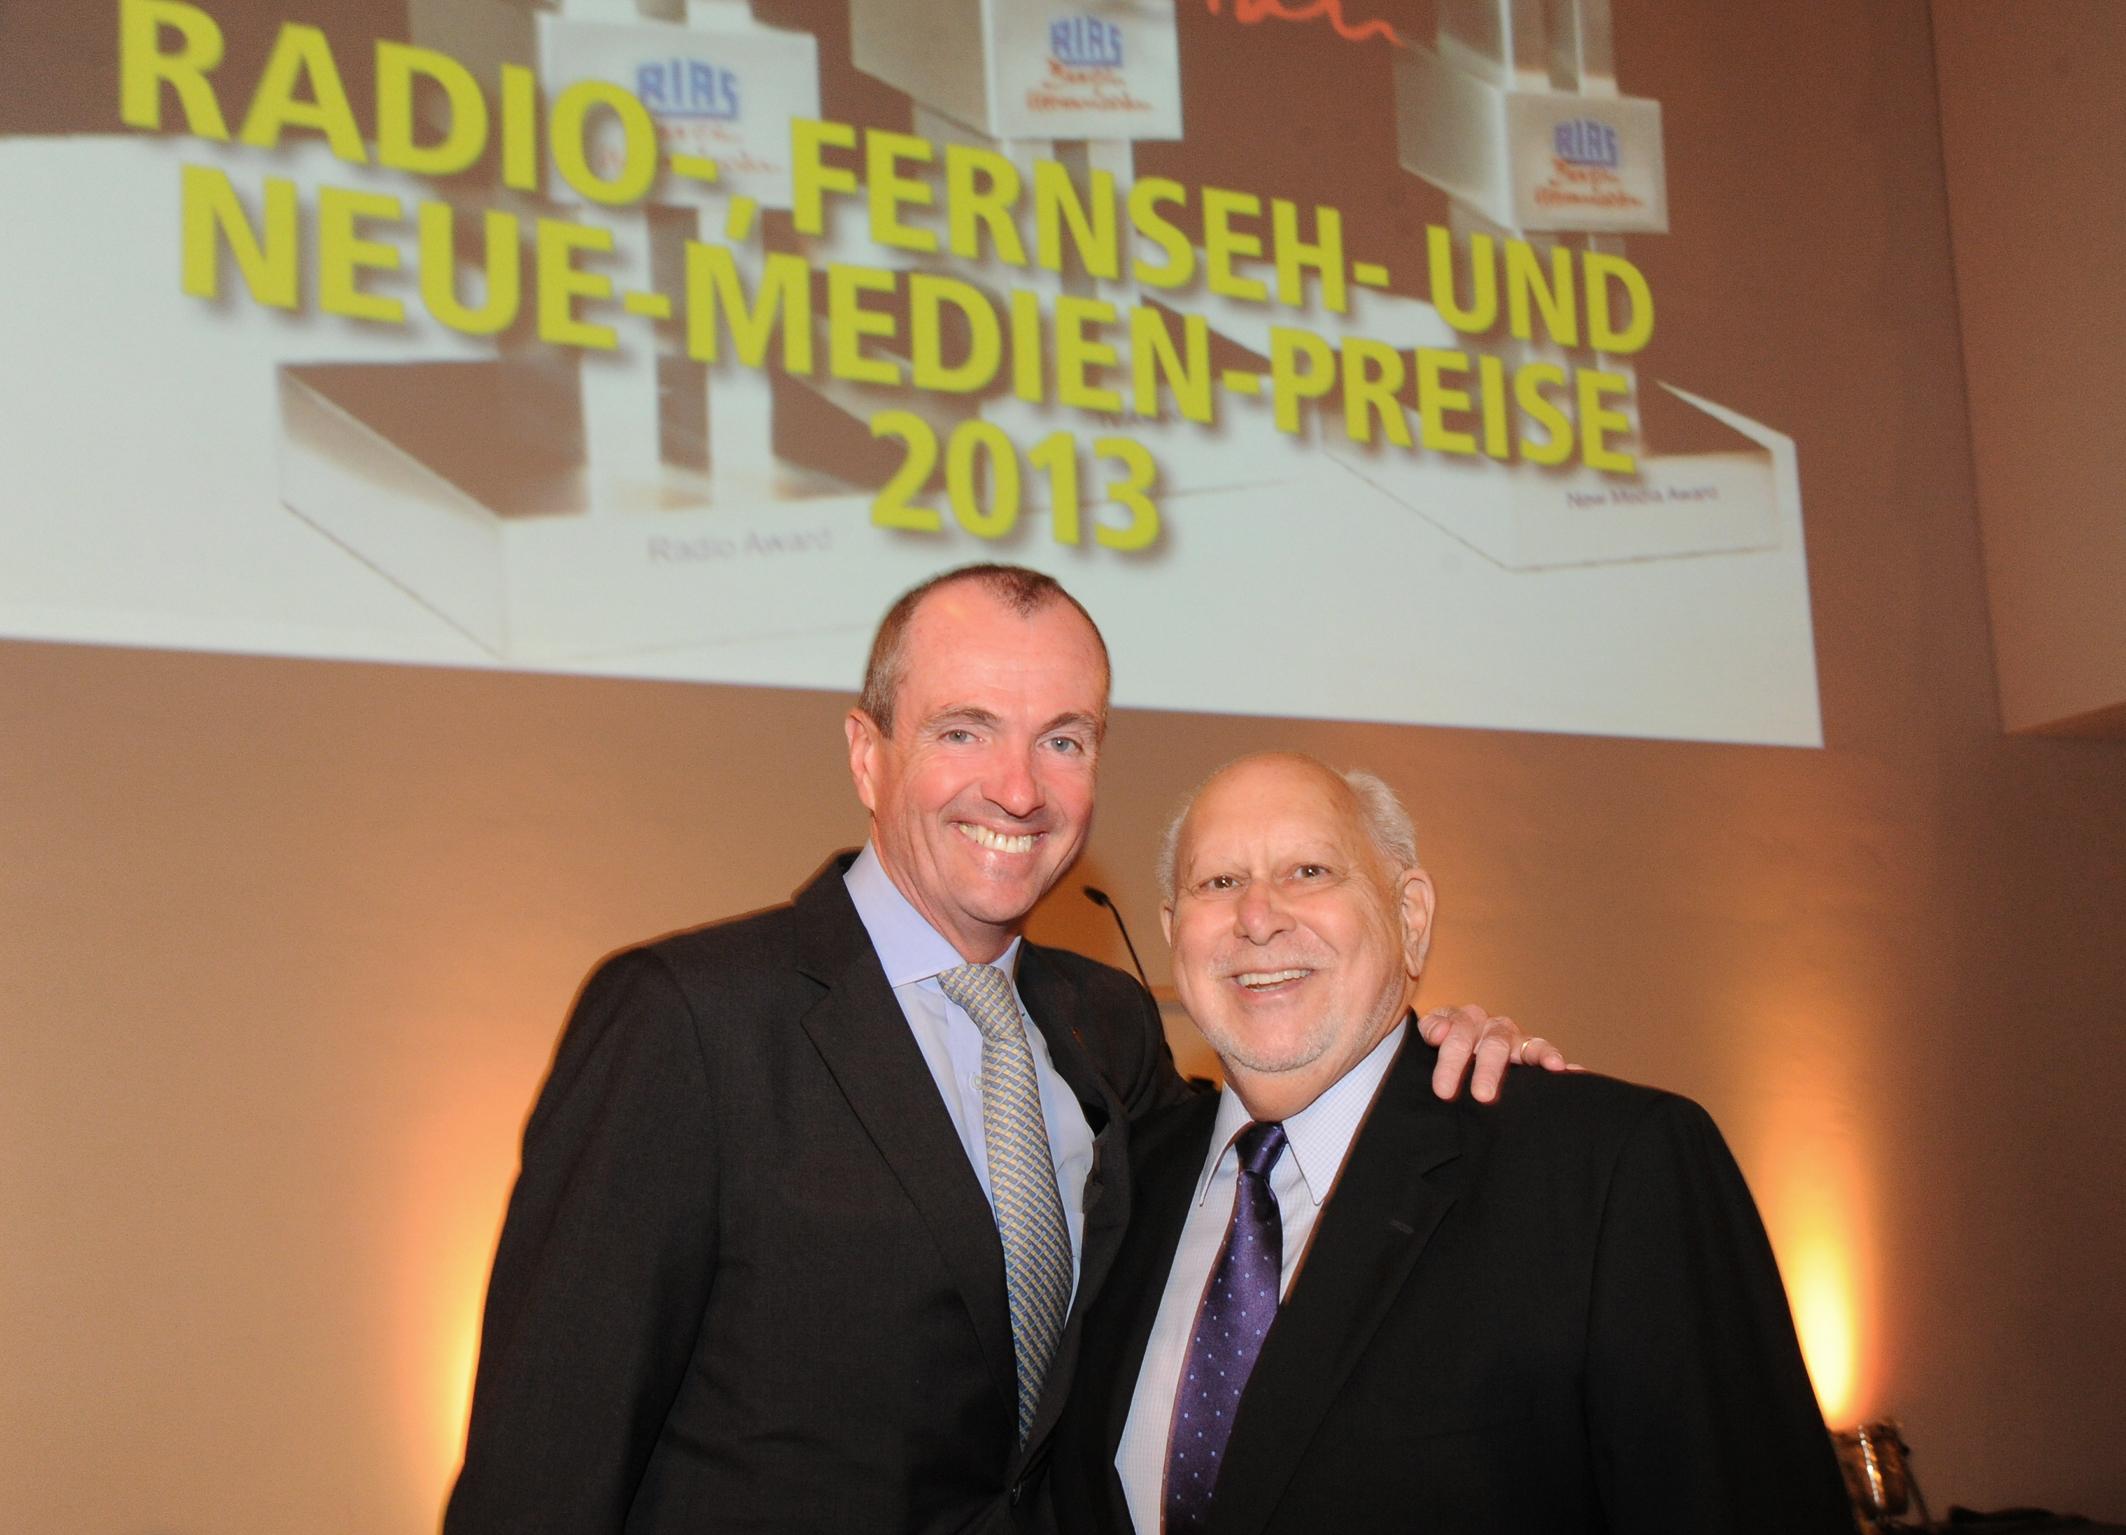 IBB Director Richard Lobo Congratulates RIAS Award Winners in Berlin